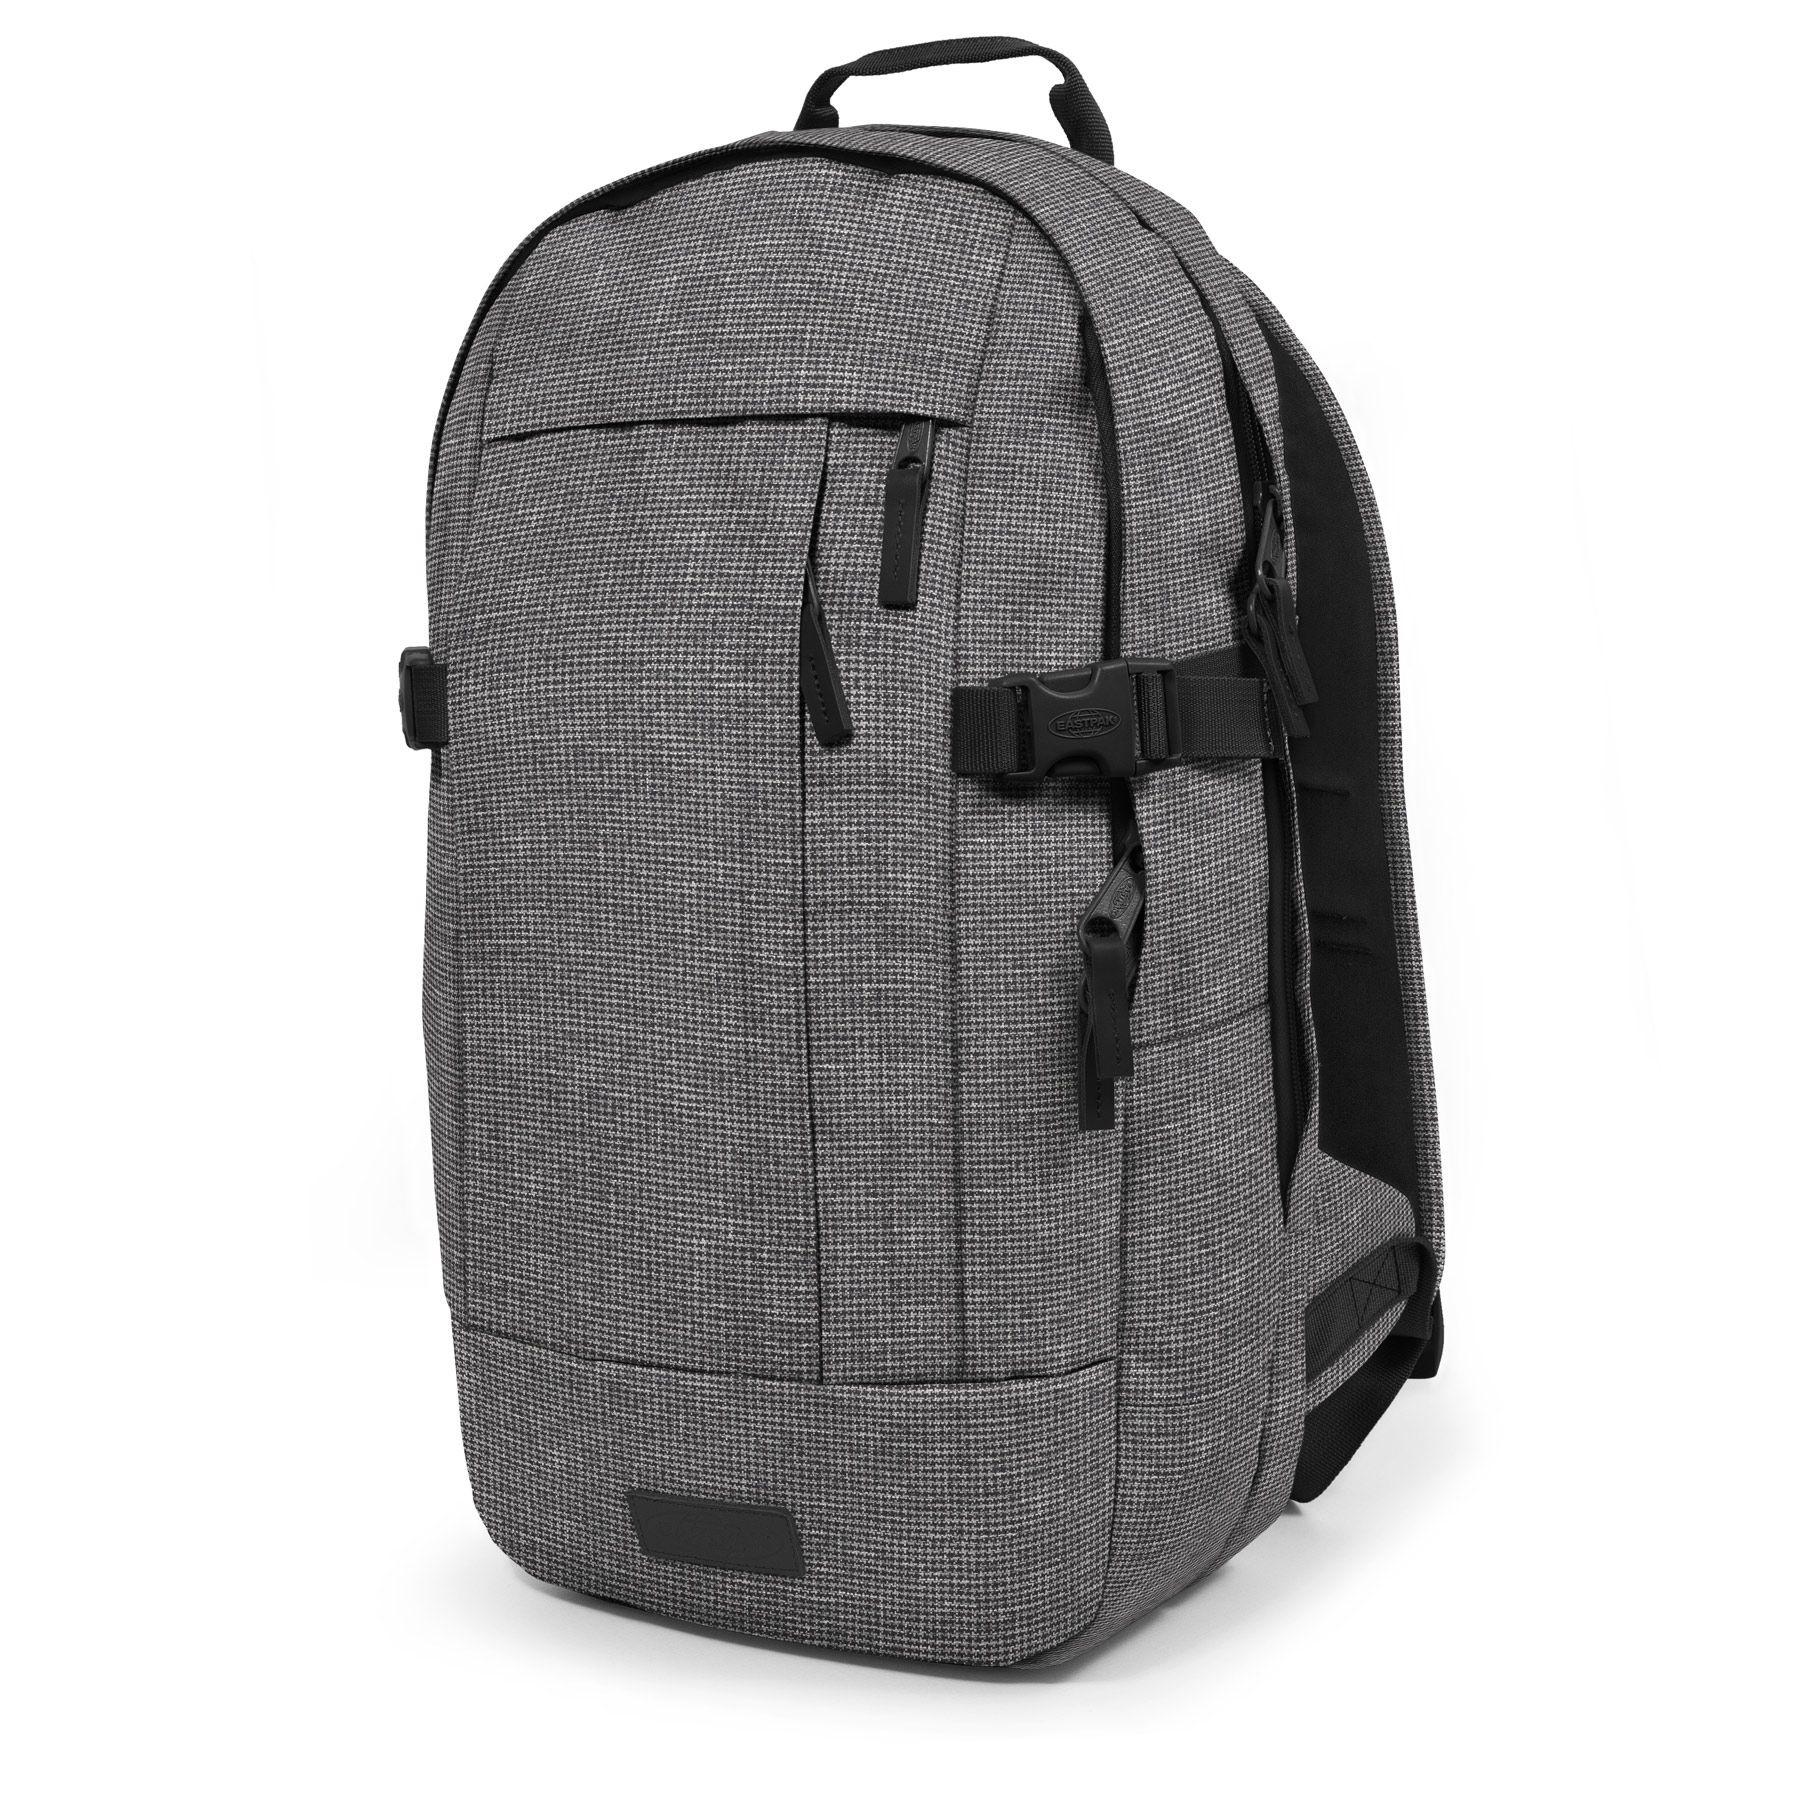 Eastpak Eastpak Extrafloid Ash Blend 15 inch laptop rugzak